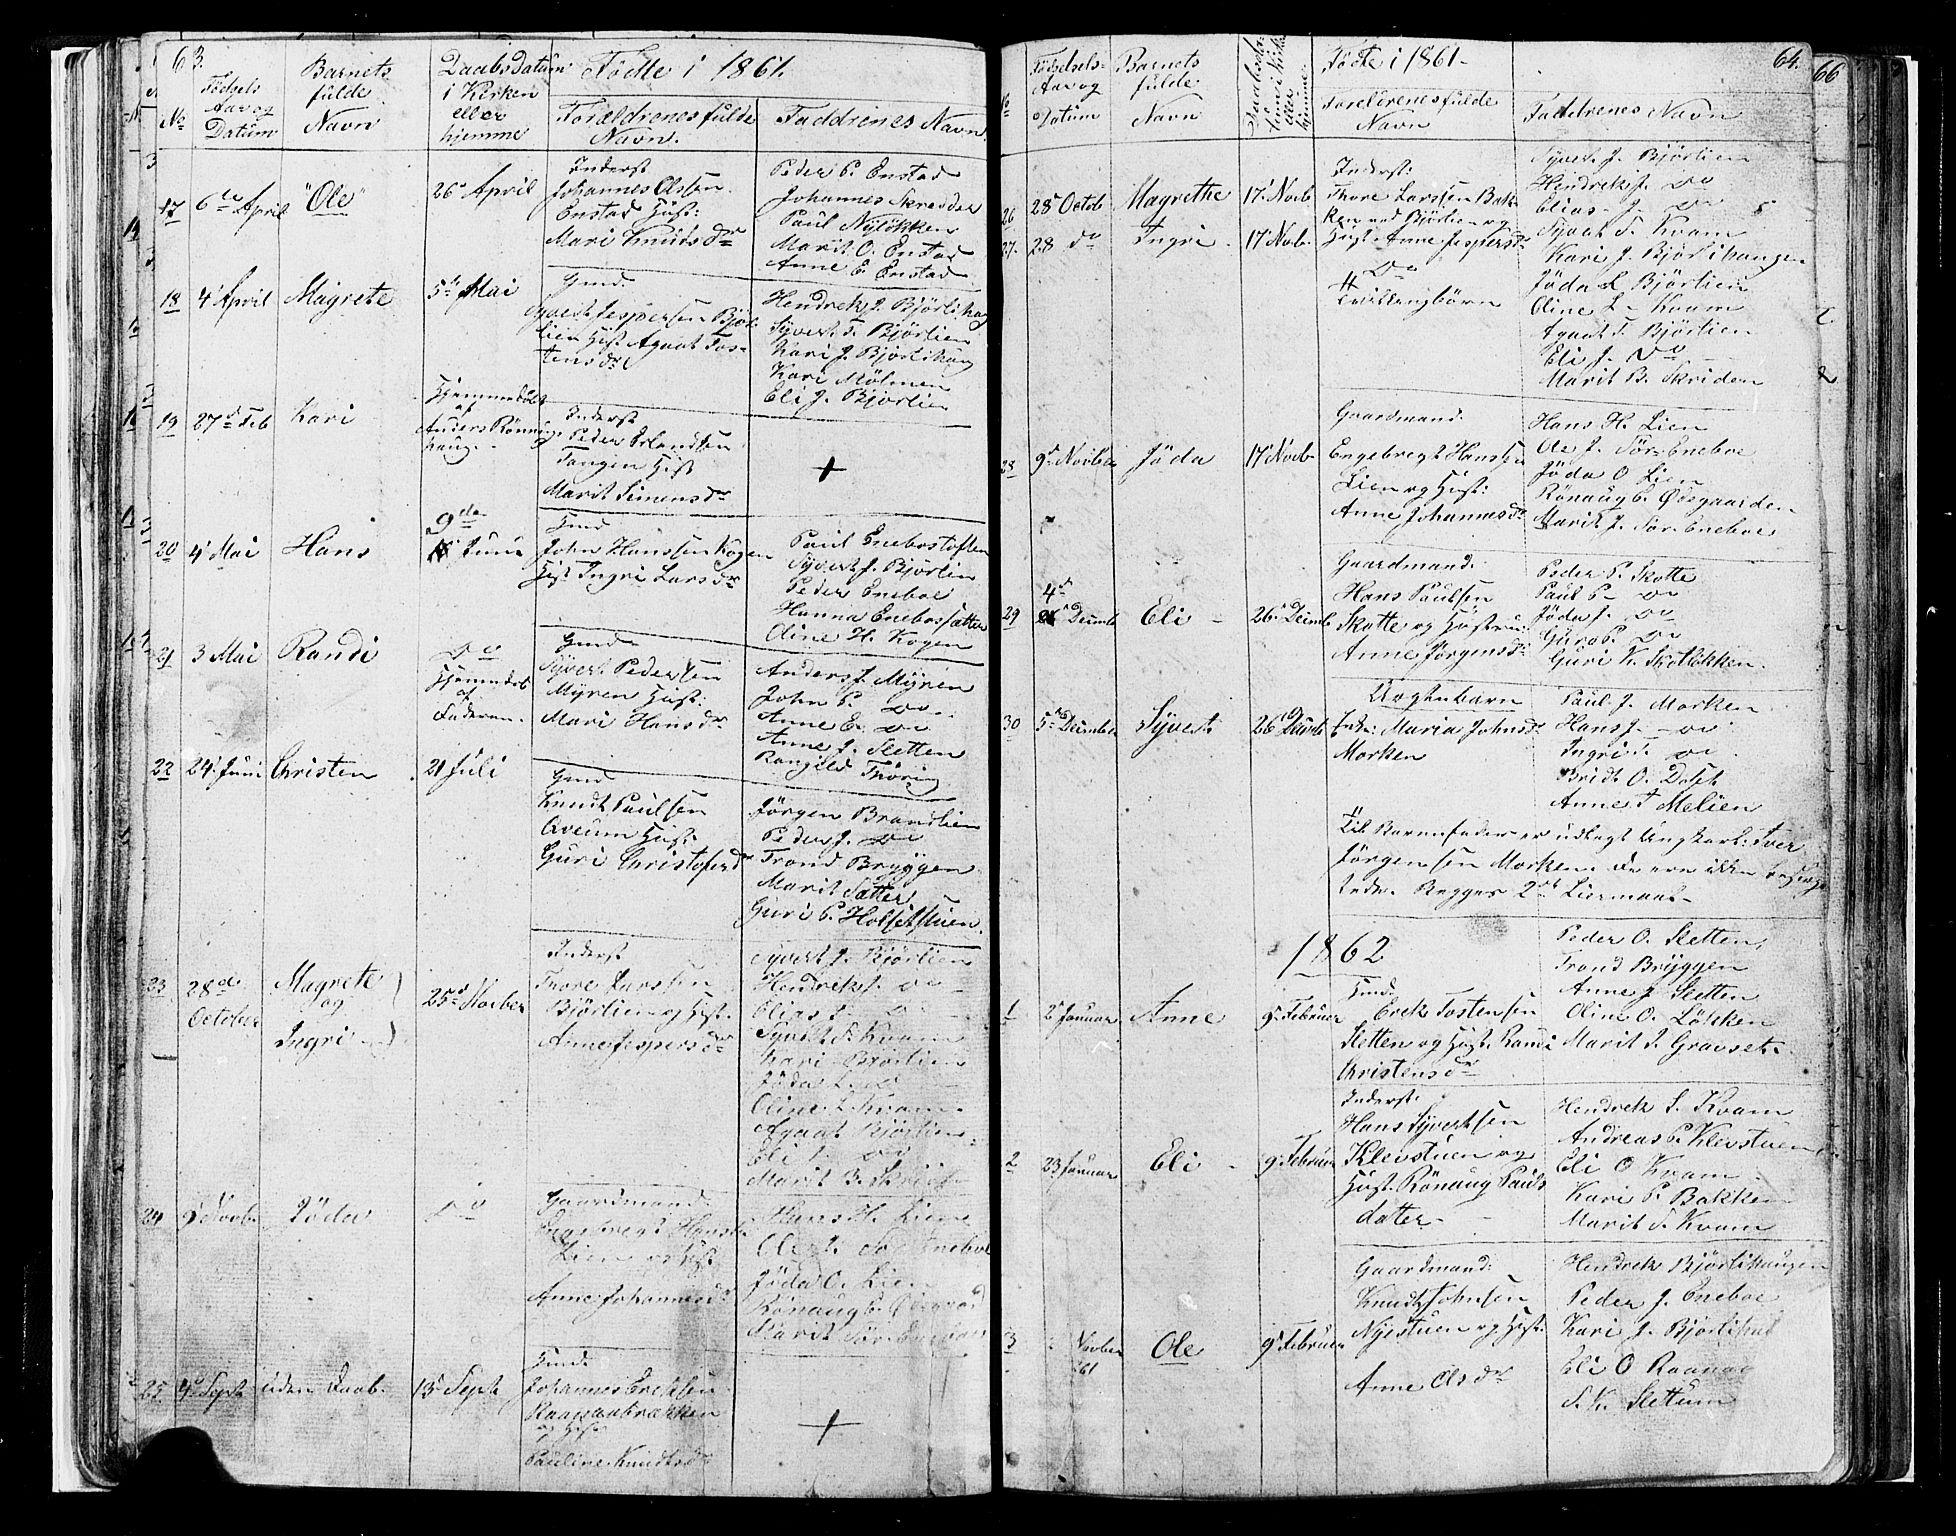 SAH, Lesja prestekontor, Klokkerbok nr. 4, 1842-1871, s. 63-64